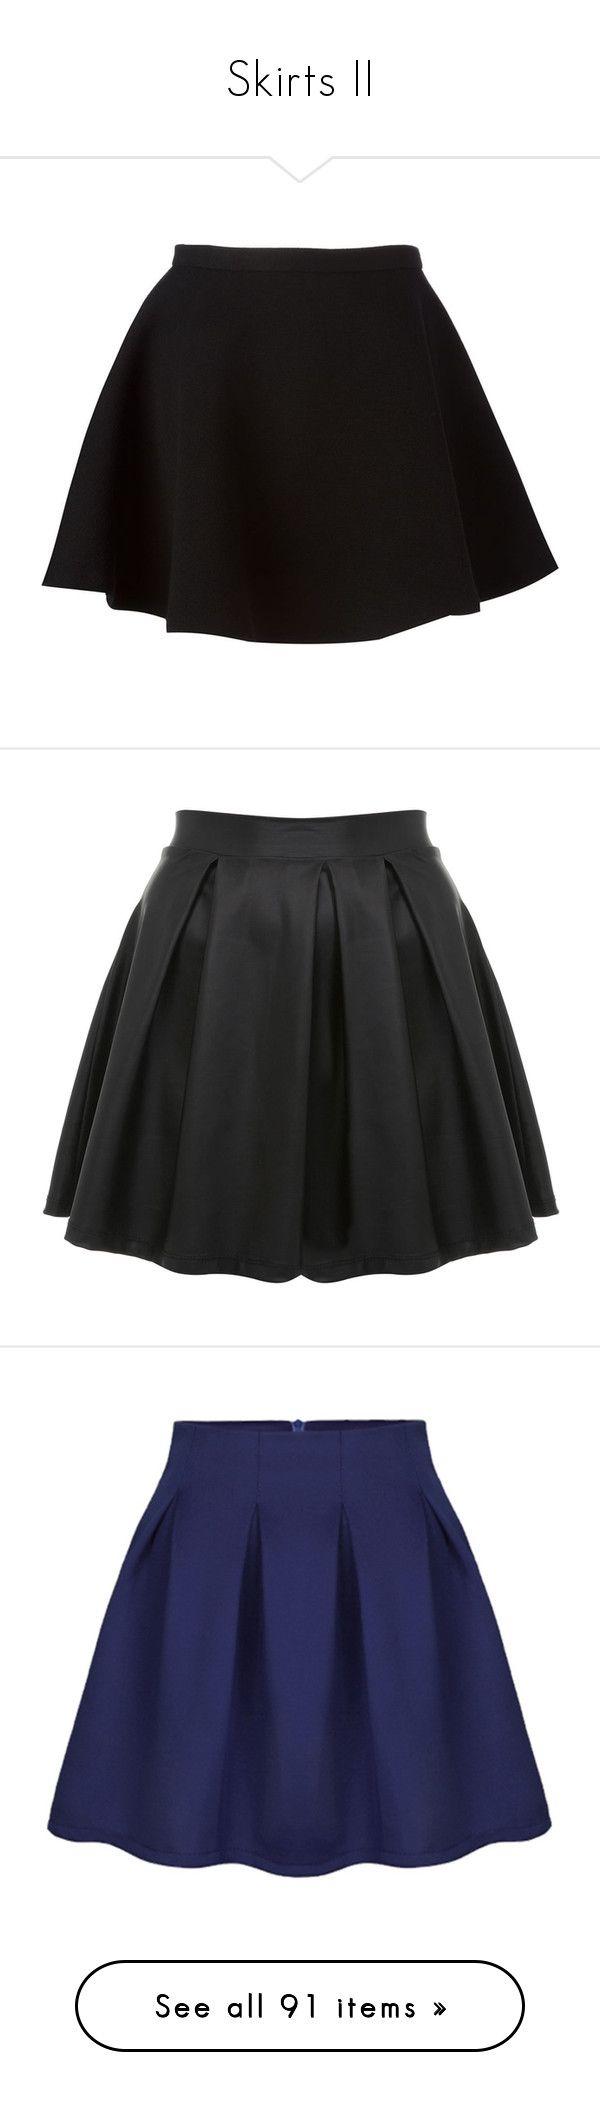 """Skirts II"" by lucyheartyui on Polyvore featuring skirts, mini skirts, bottoms, saias, faldas, black, high waisted skirt, ruffle skirt, ruffle mini skirt i high waisted ruffle skirt"